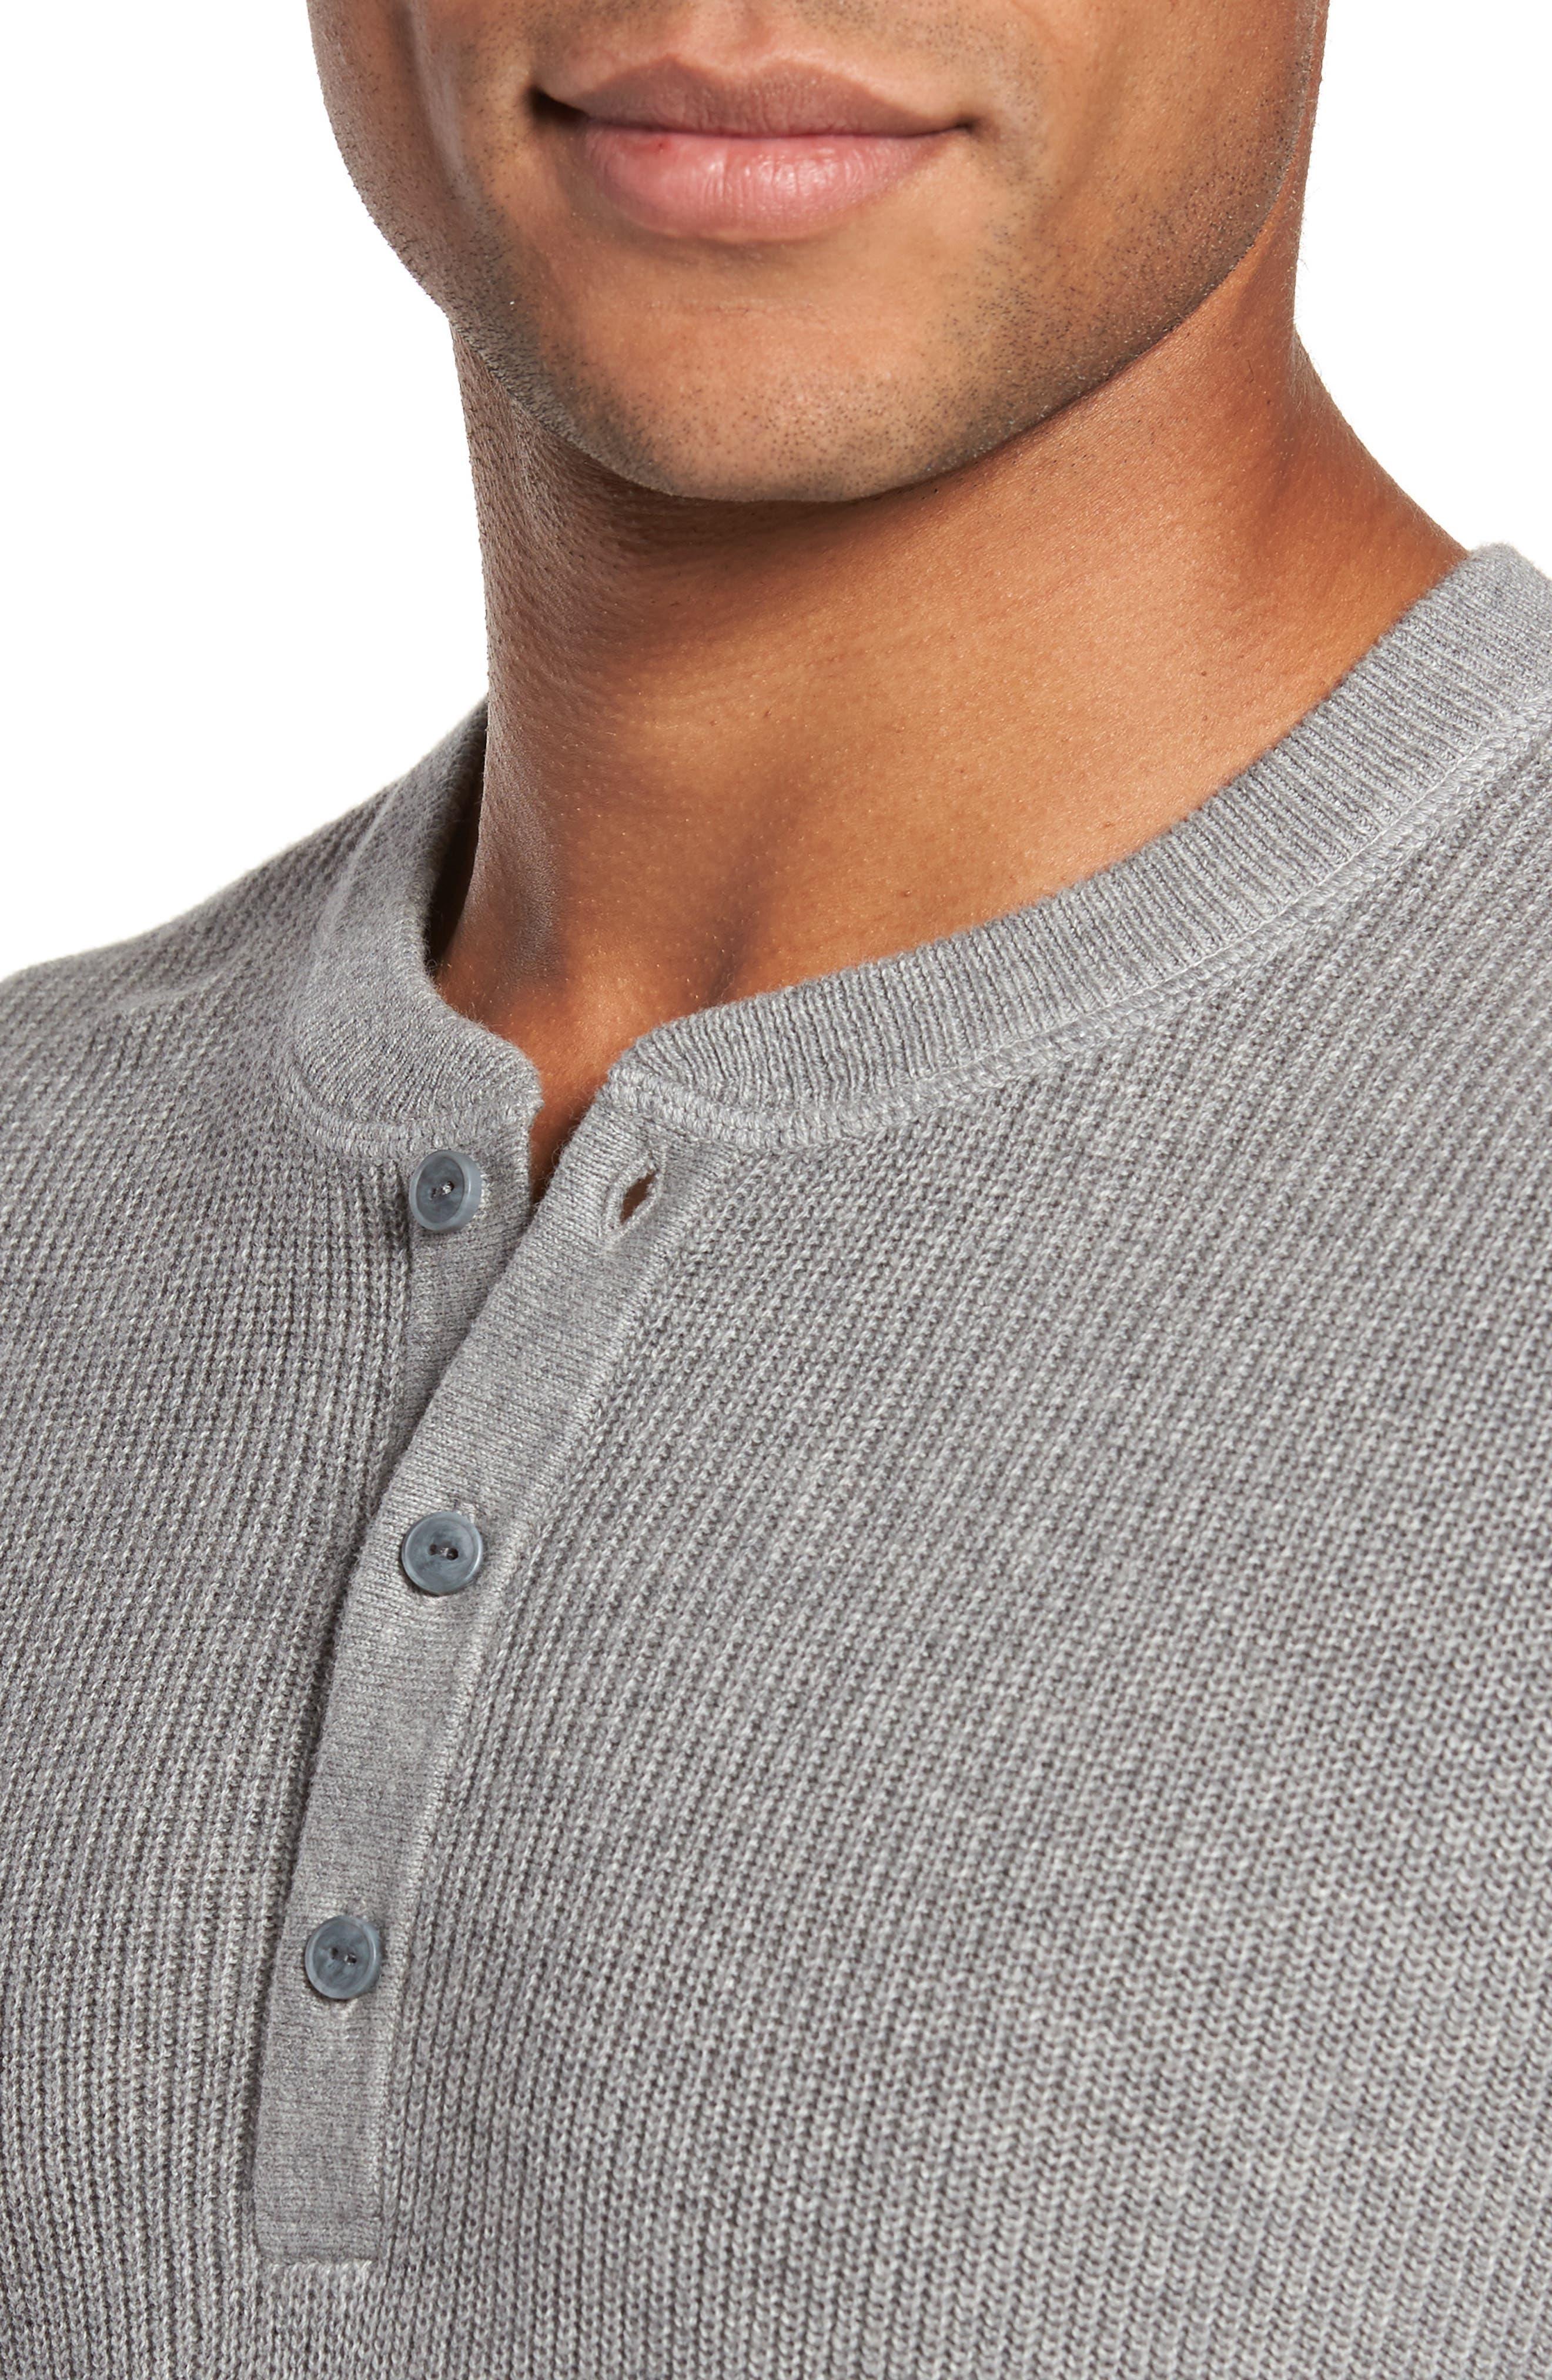 Cotton & Cashmere Henley Sweater,                             Alternate thumbnail 4, color,                             030